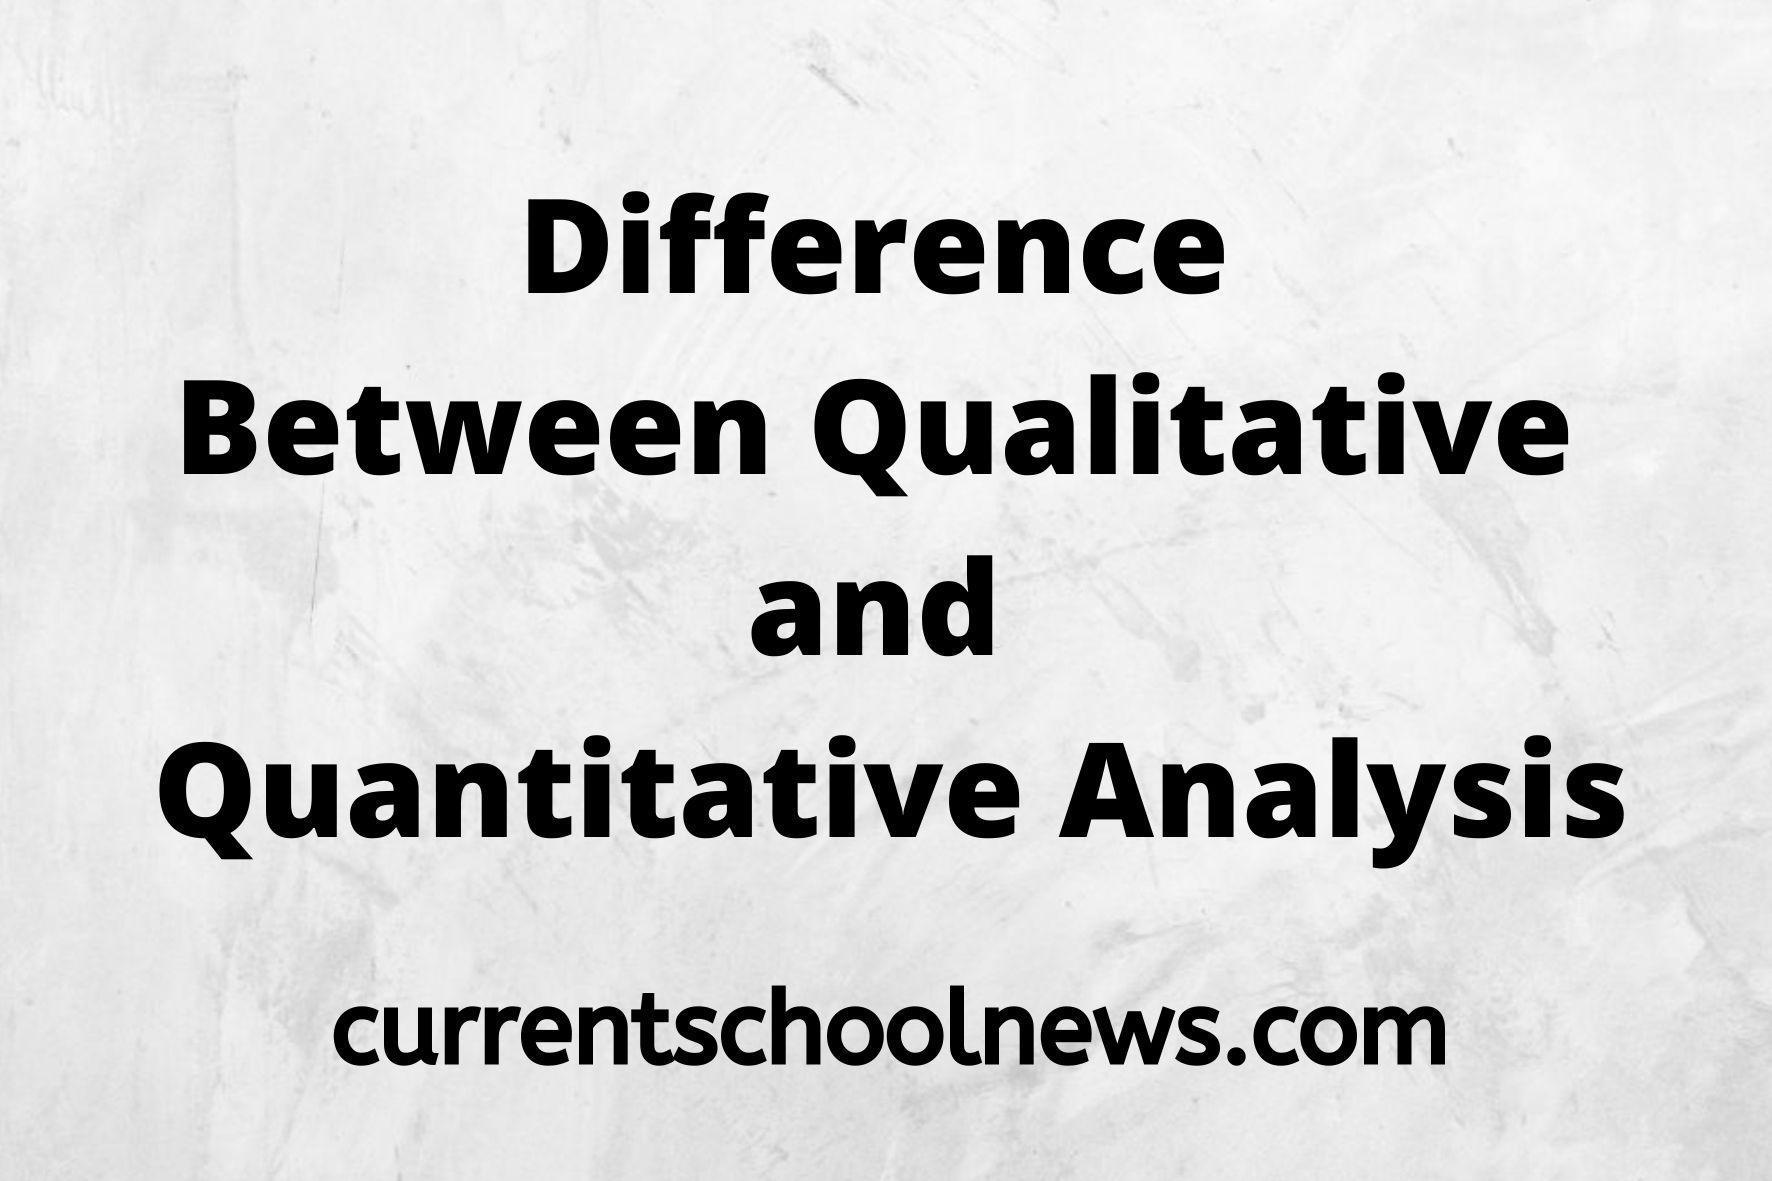 10 Differences between Qualitative Analysis and Quantitative Analysis